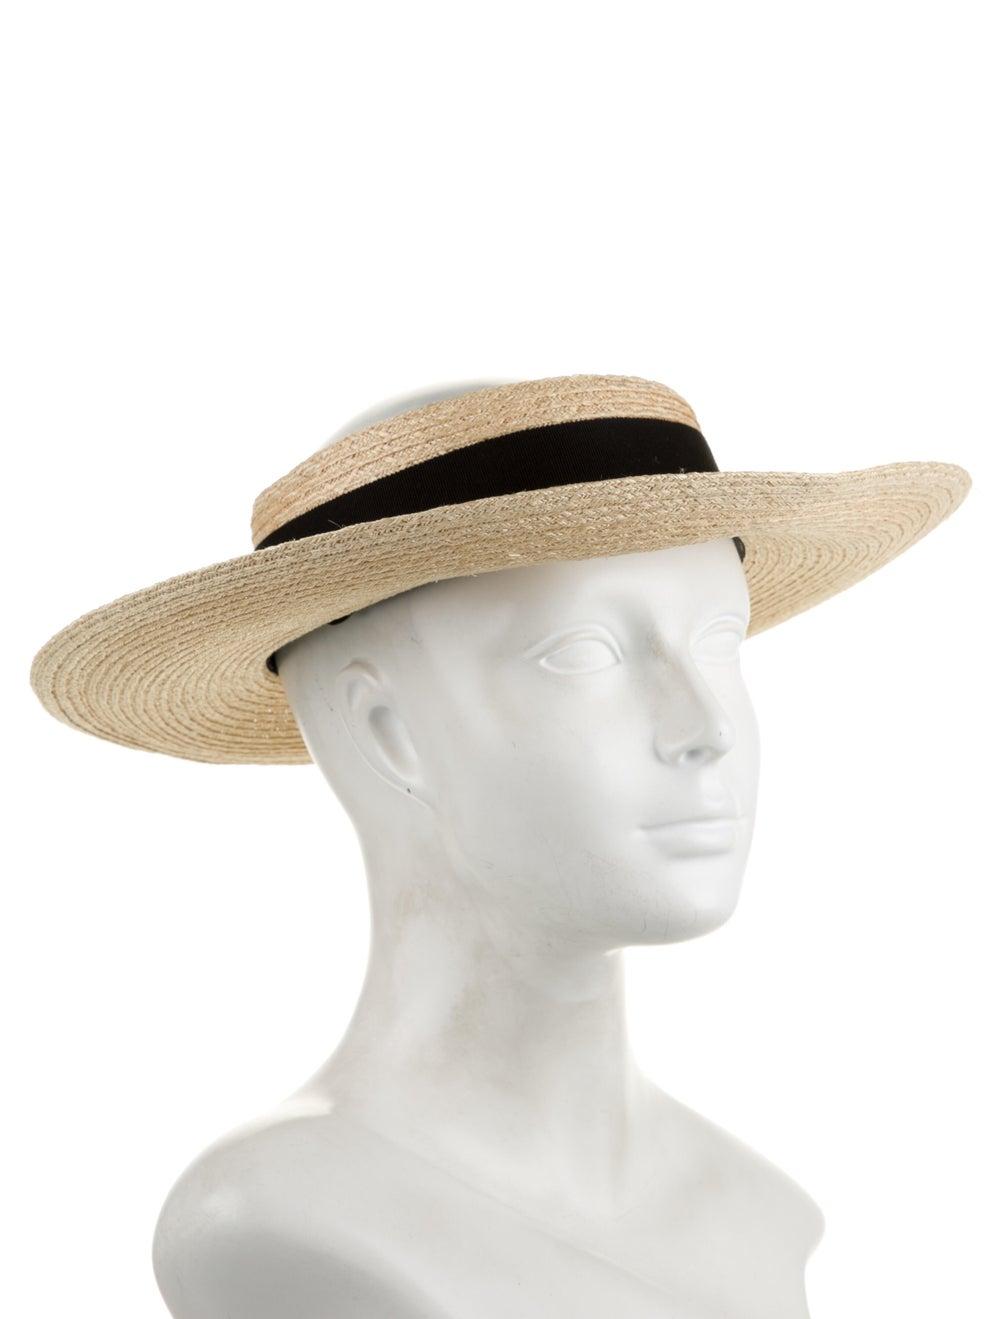 Eugenia Kim Straw Wide Brim Hat Tan - image 3